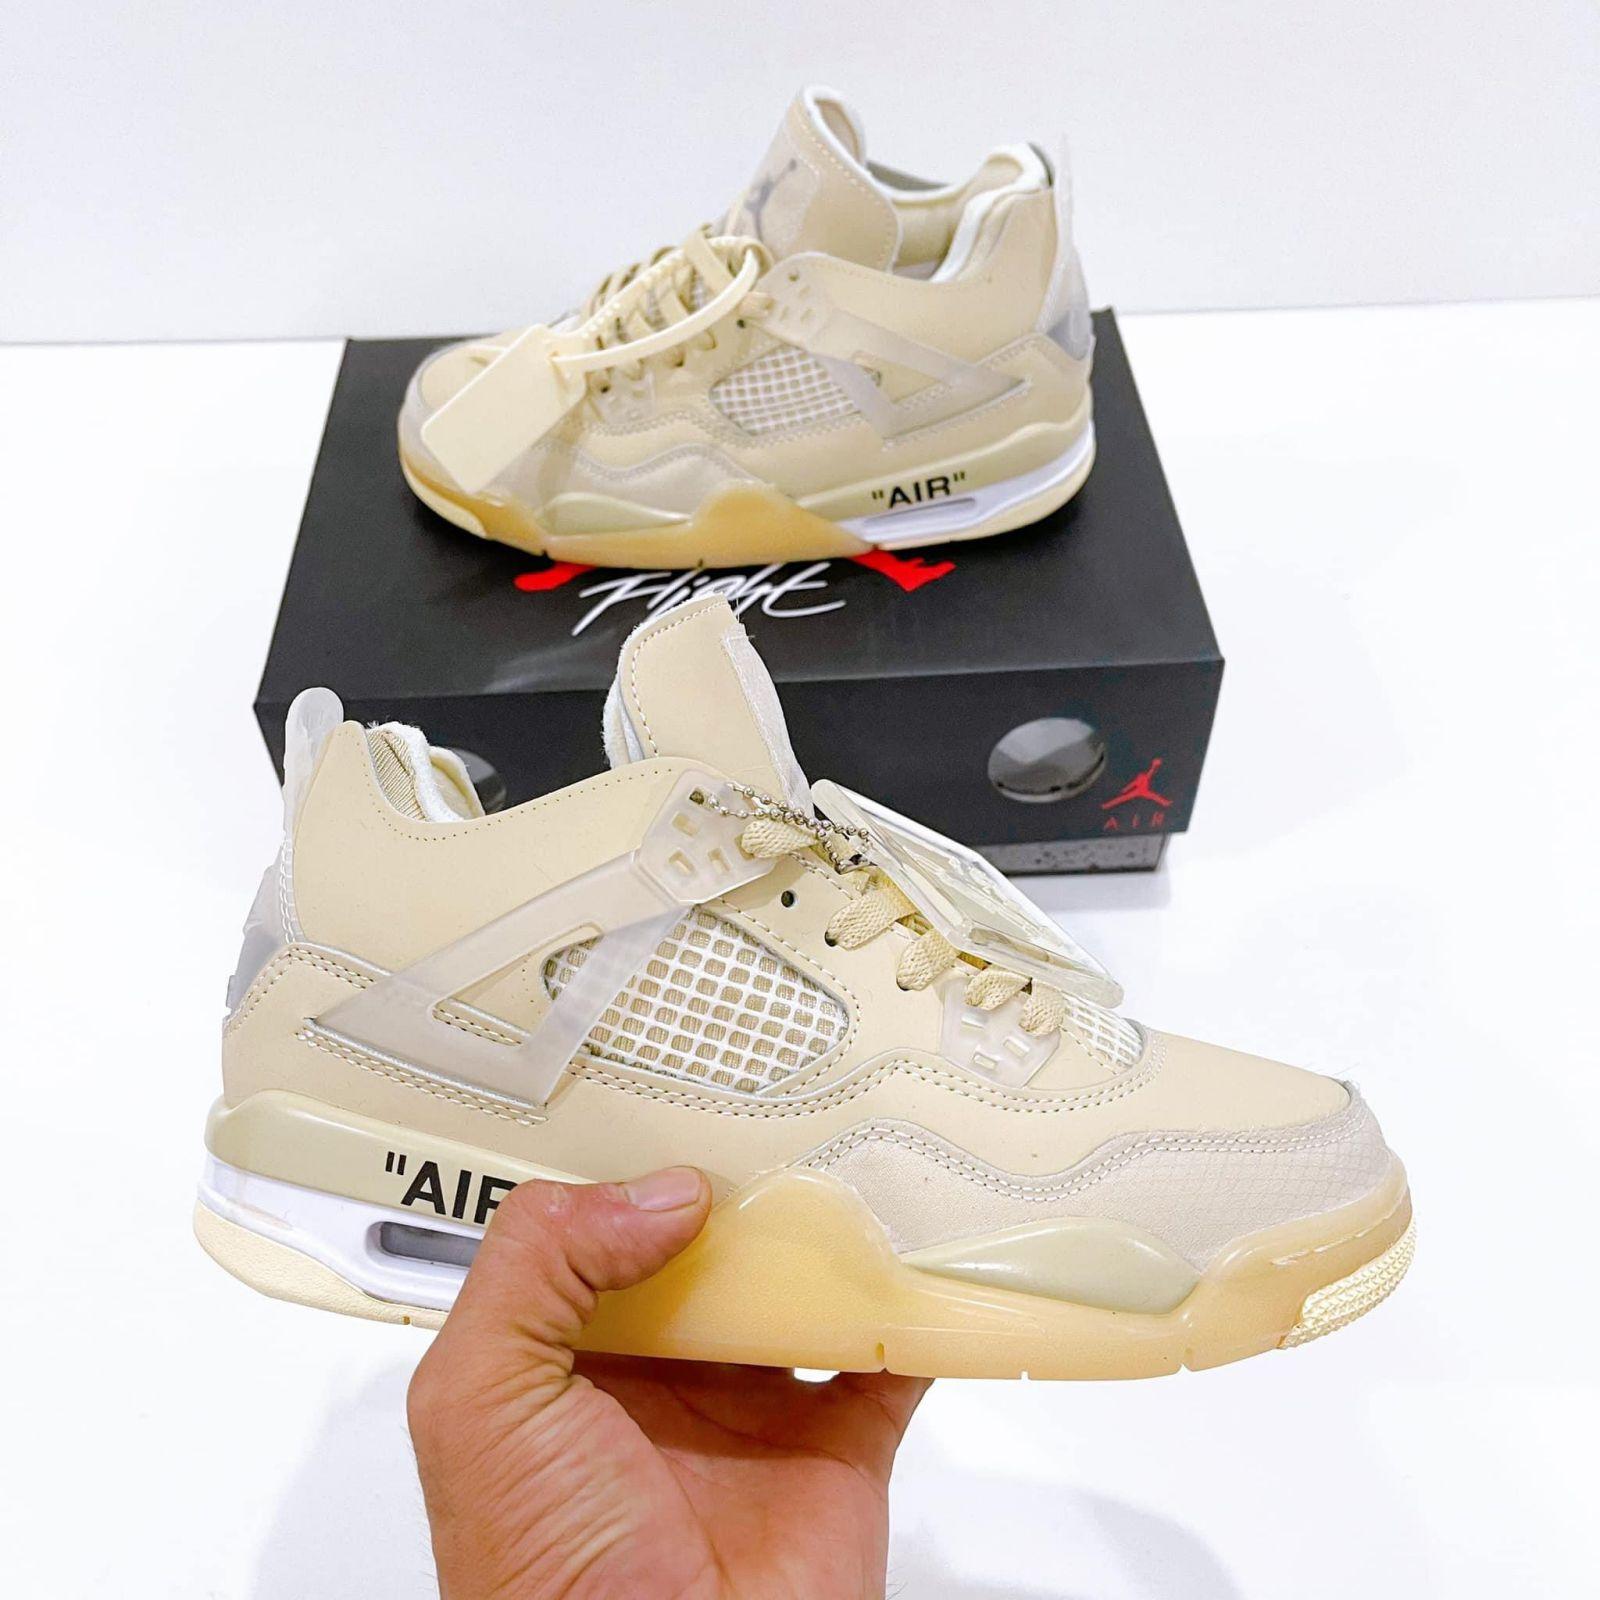 Nike Jordan 4 Retro Off White Sail